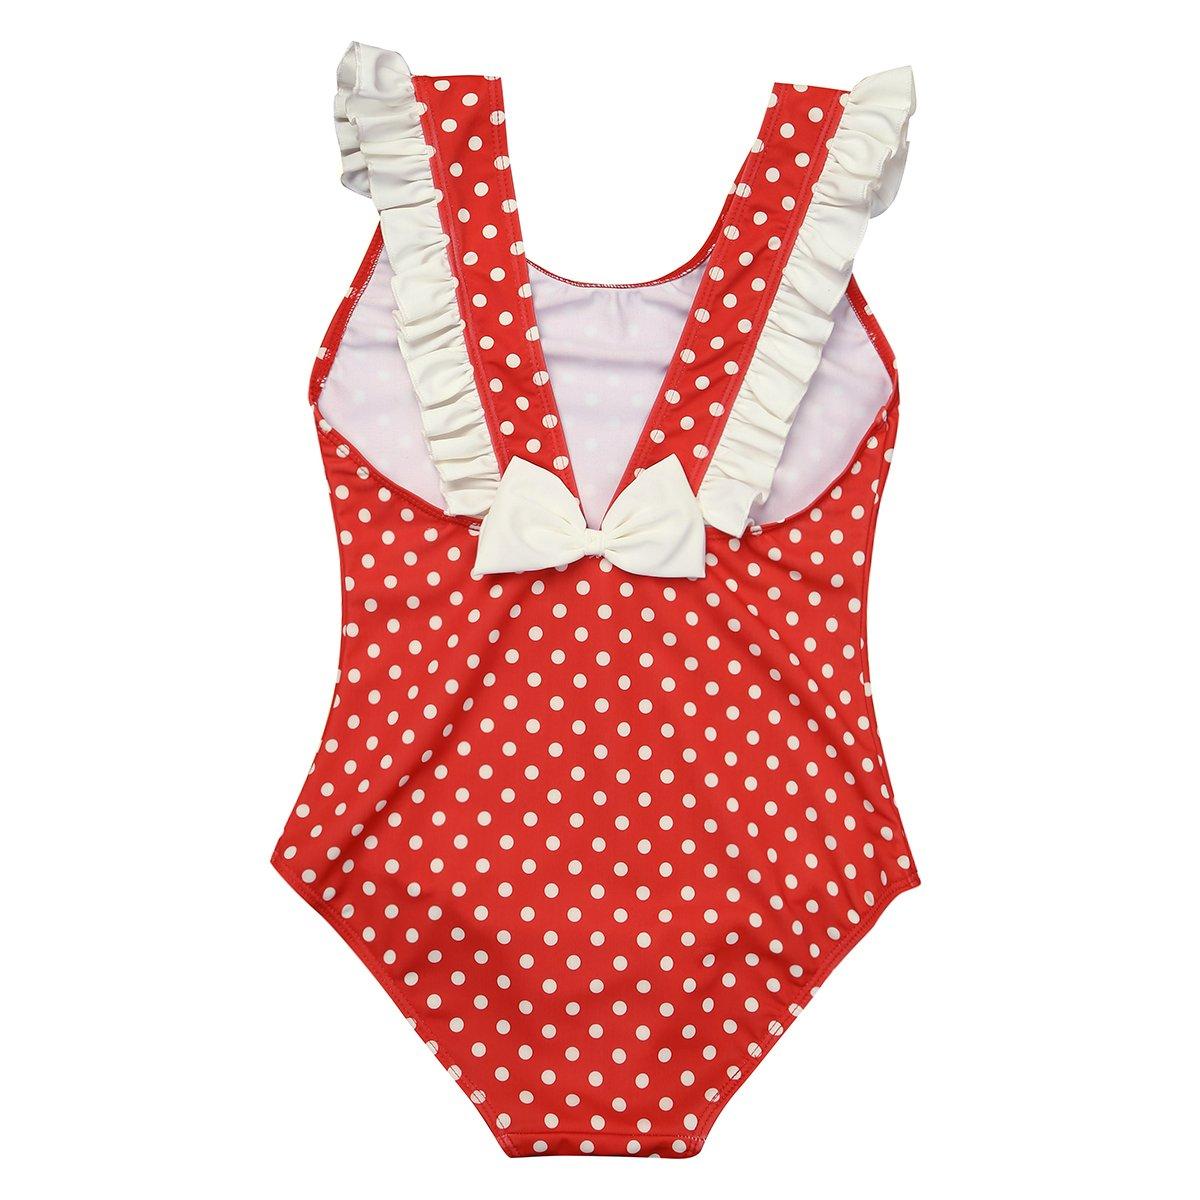 winying Kids Girls Red One Piece Polka Dots Deep V Back Swimsuit Beachwear